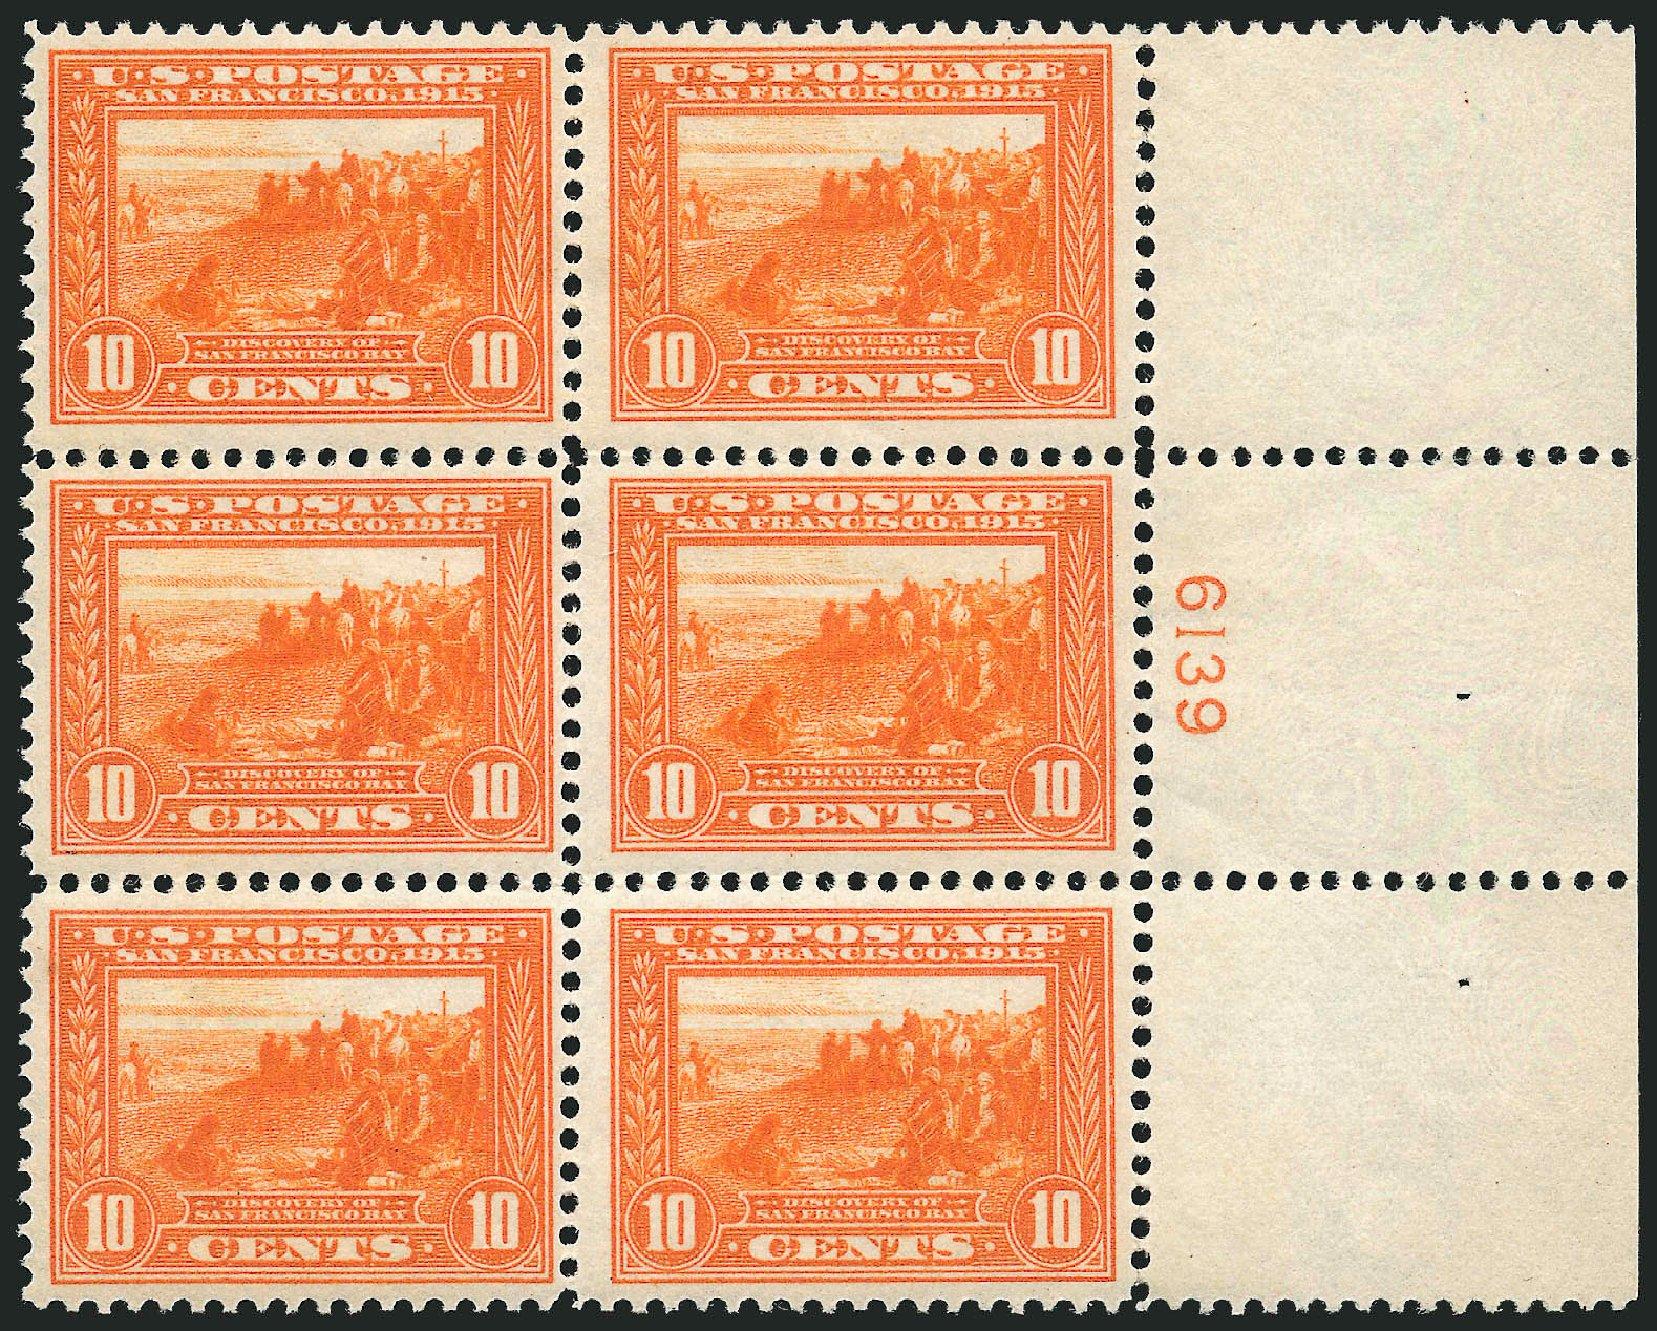 Values of US Stamps Scott Cat. #400A: 1913 10c Panama-Pacific Exposition. Robert Siegel Auction Galleries, Feb 2015, Sale 1092, Lot 1302